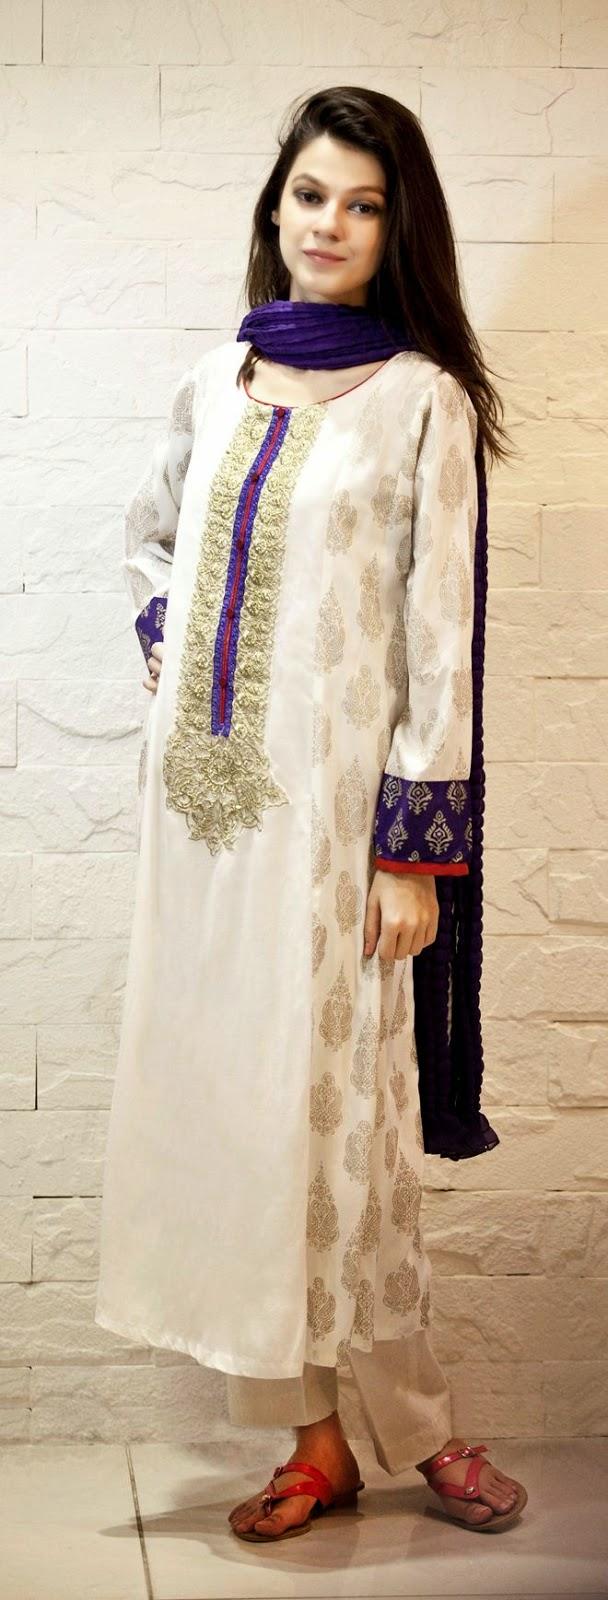 2ddd540d3 Winter Long Shirts Fashion Pakistan